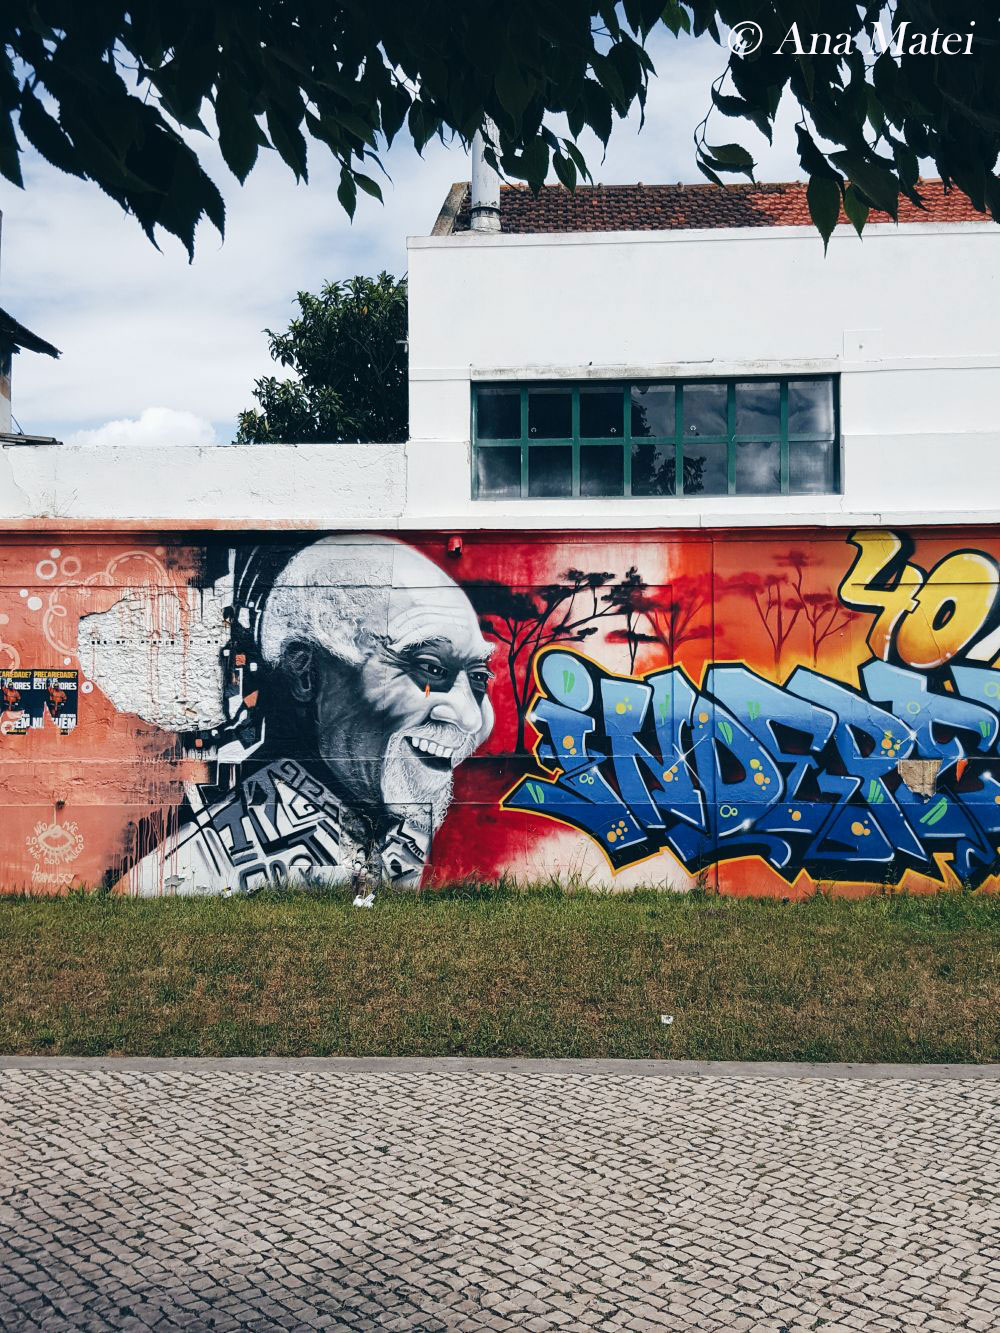 Nomen-street-art-work-in-Alcantara,-Lisbon---pic-by-Ana-Matei